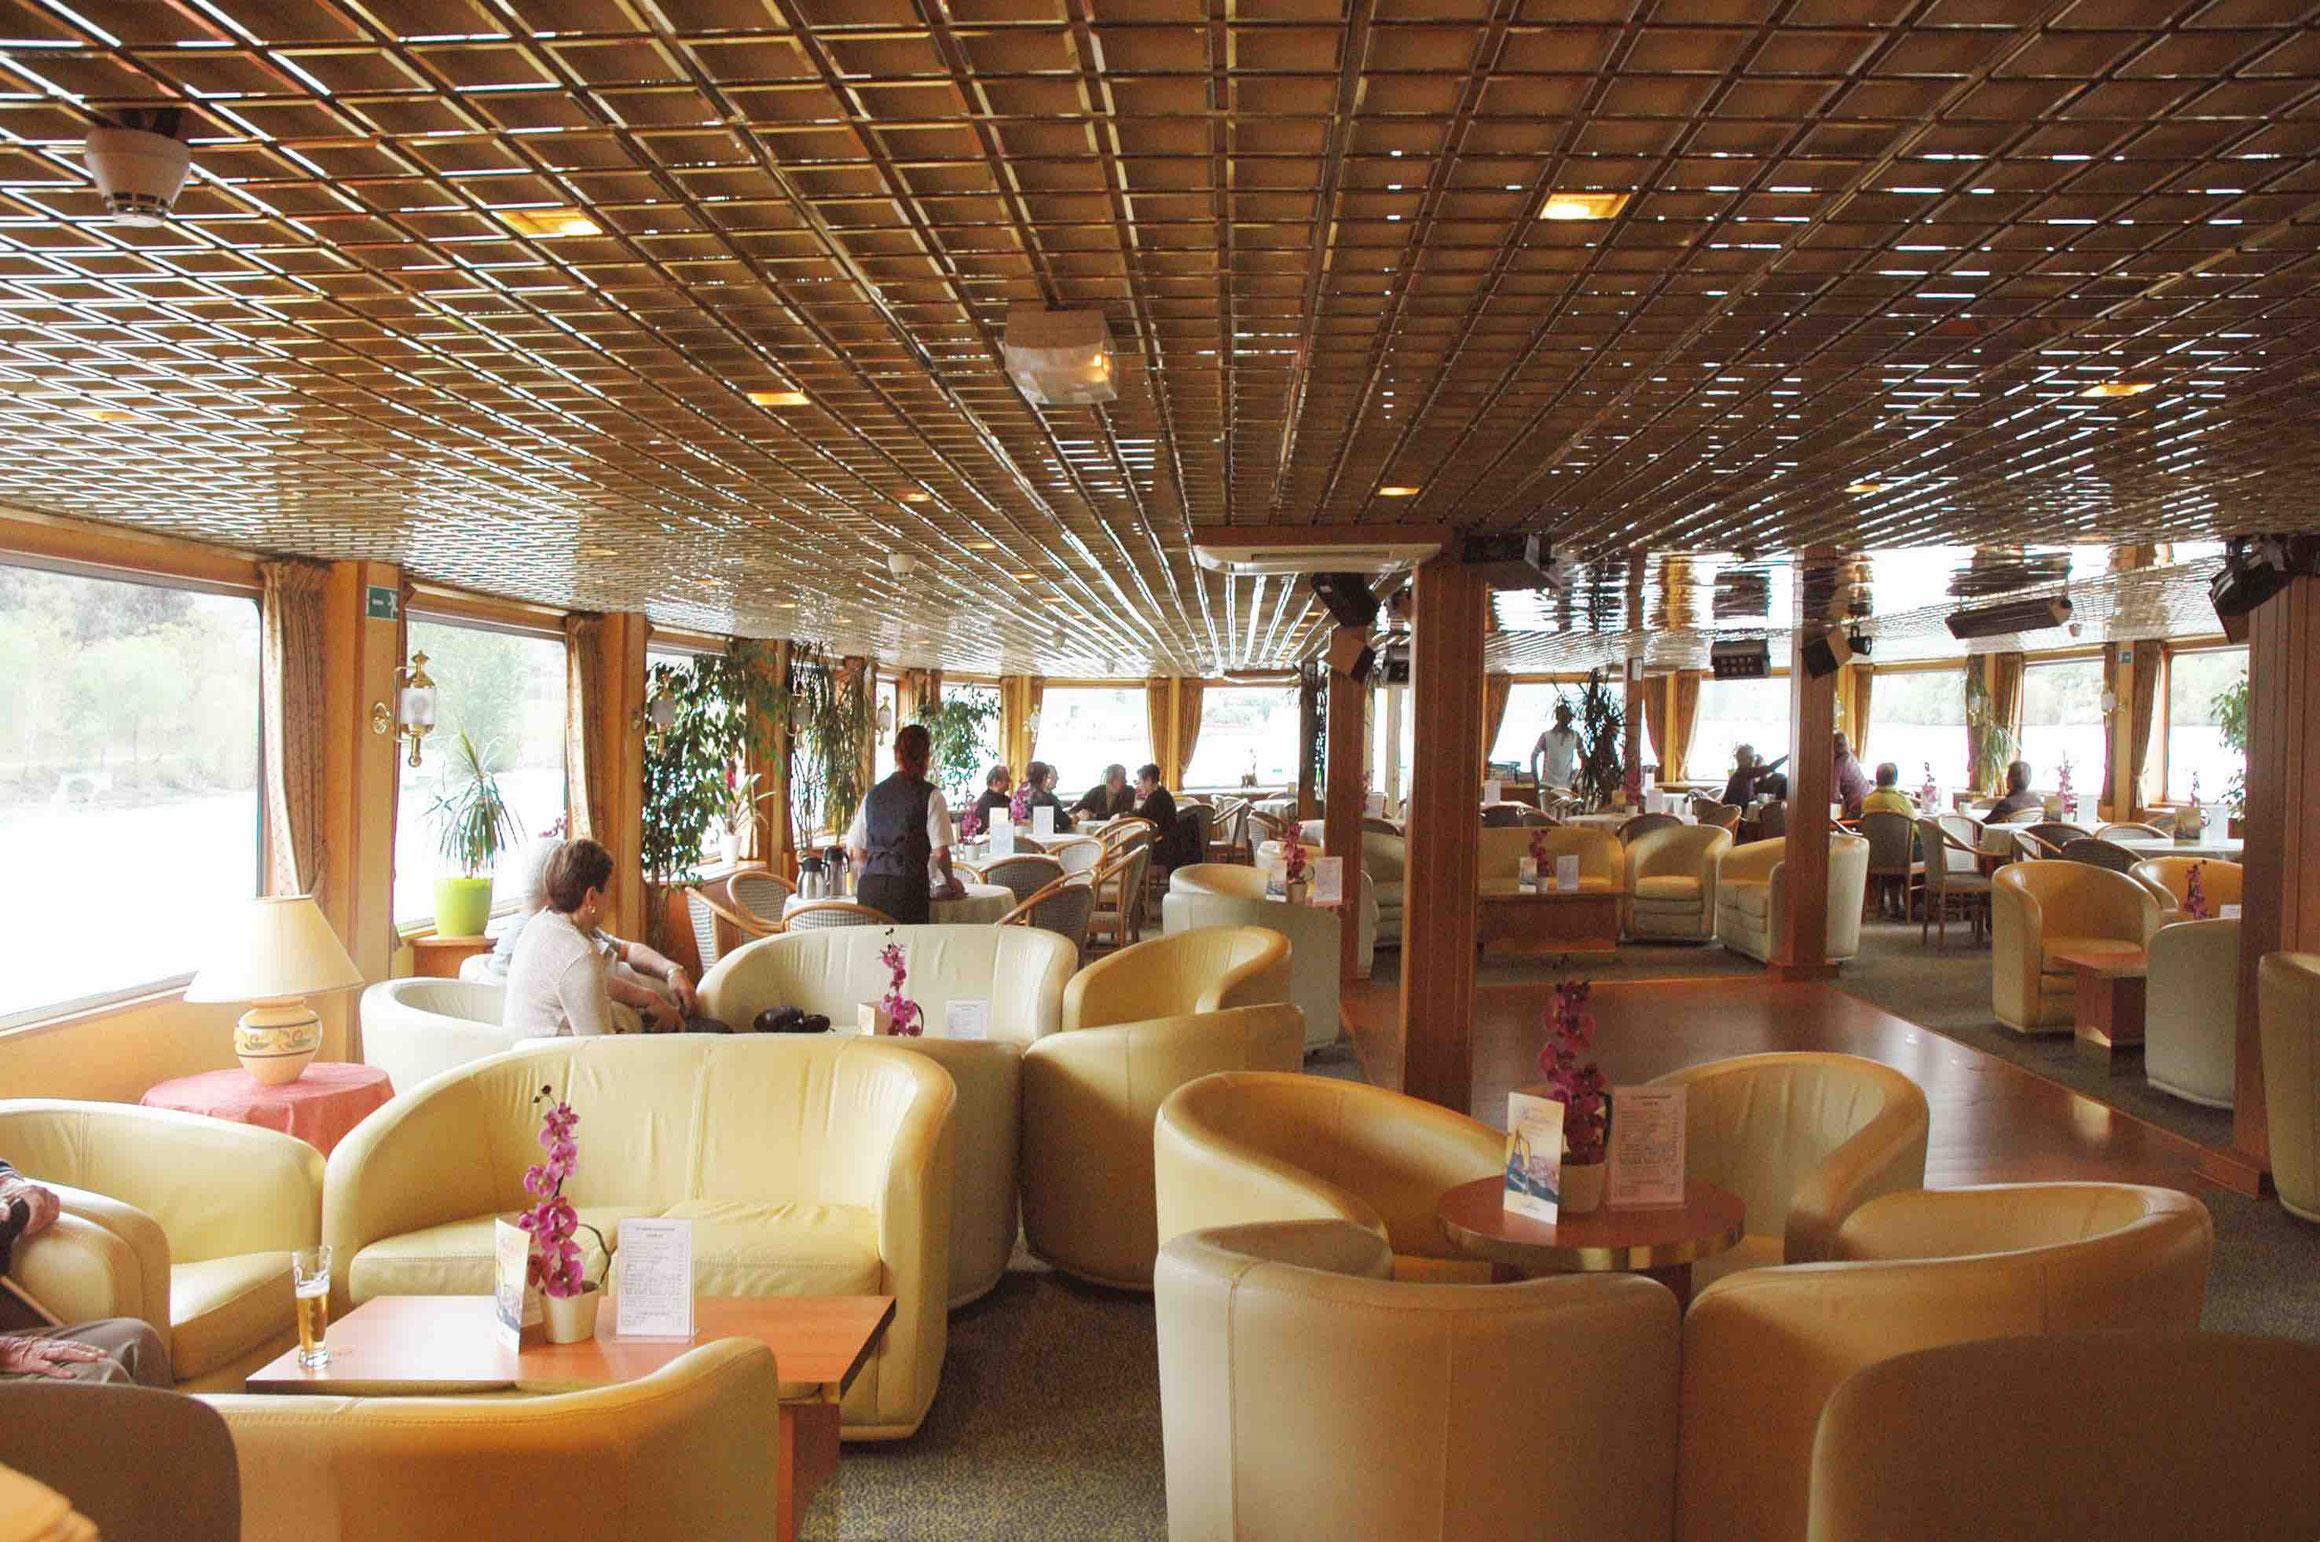 MS Magellan Salon mit Bar